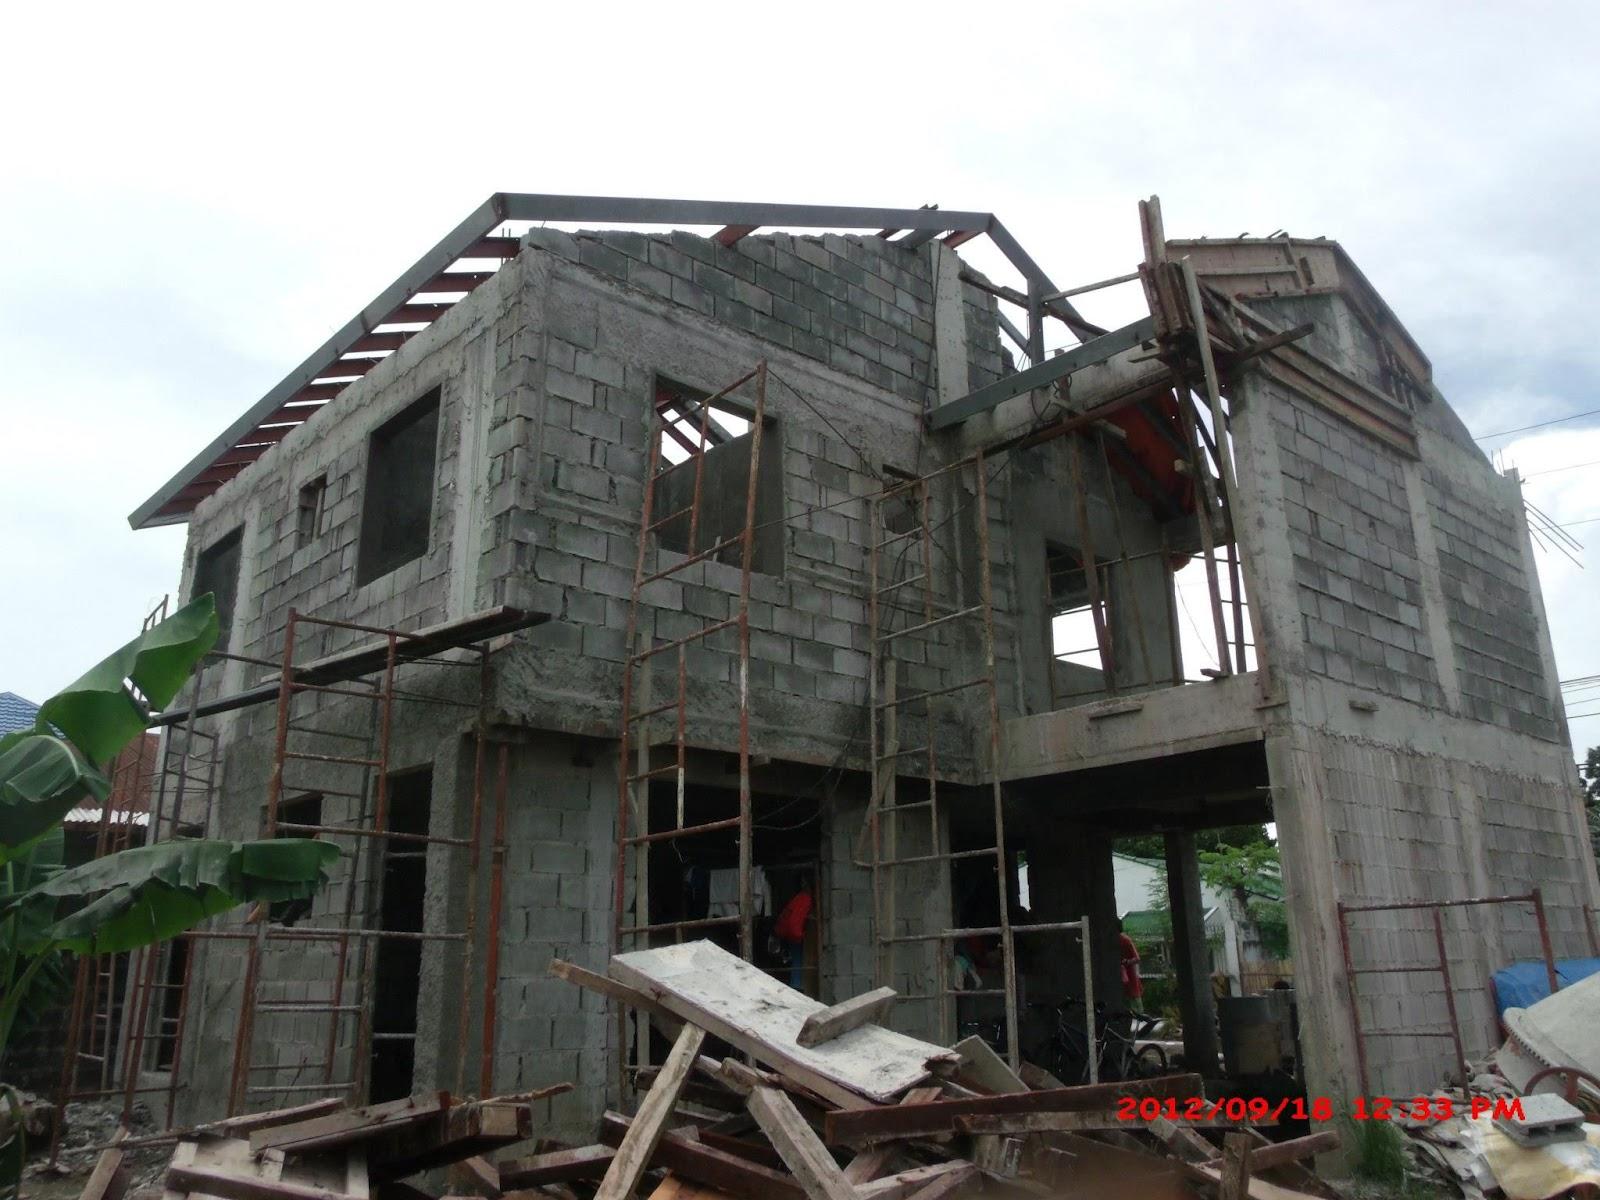 house plans online philippines philippine house design two storey iloilo alta tierra village house construction project in jaro iloilo house plans online philippines house design